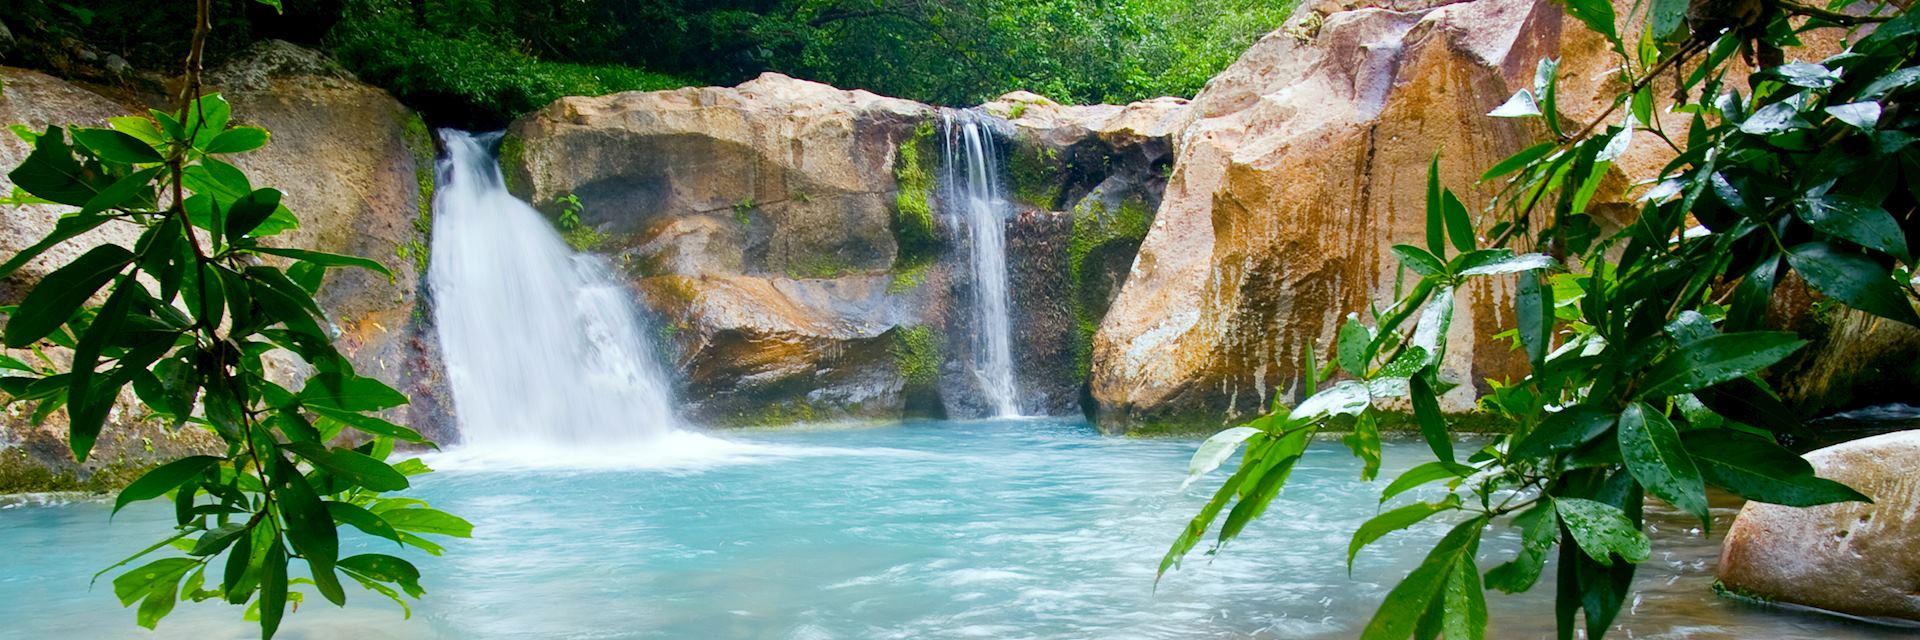 Waterfall at Rincón de la Vieja